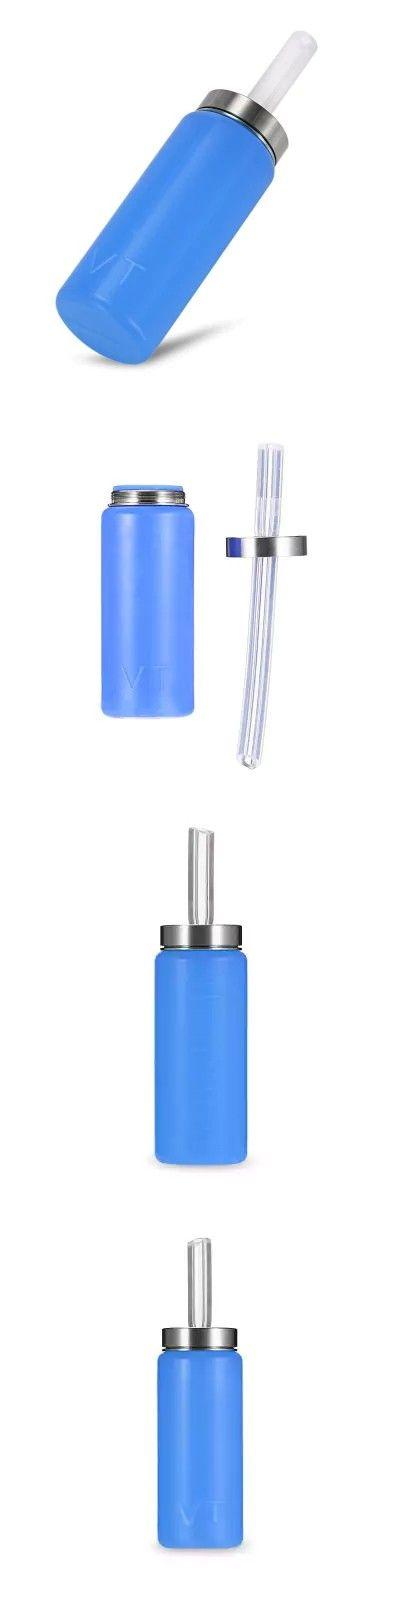 Pilot Vape 6ml Capacity E-juice Bottle -$2.66